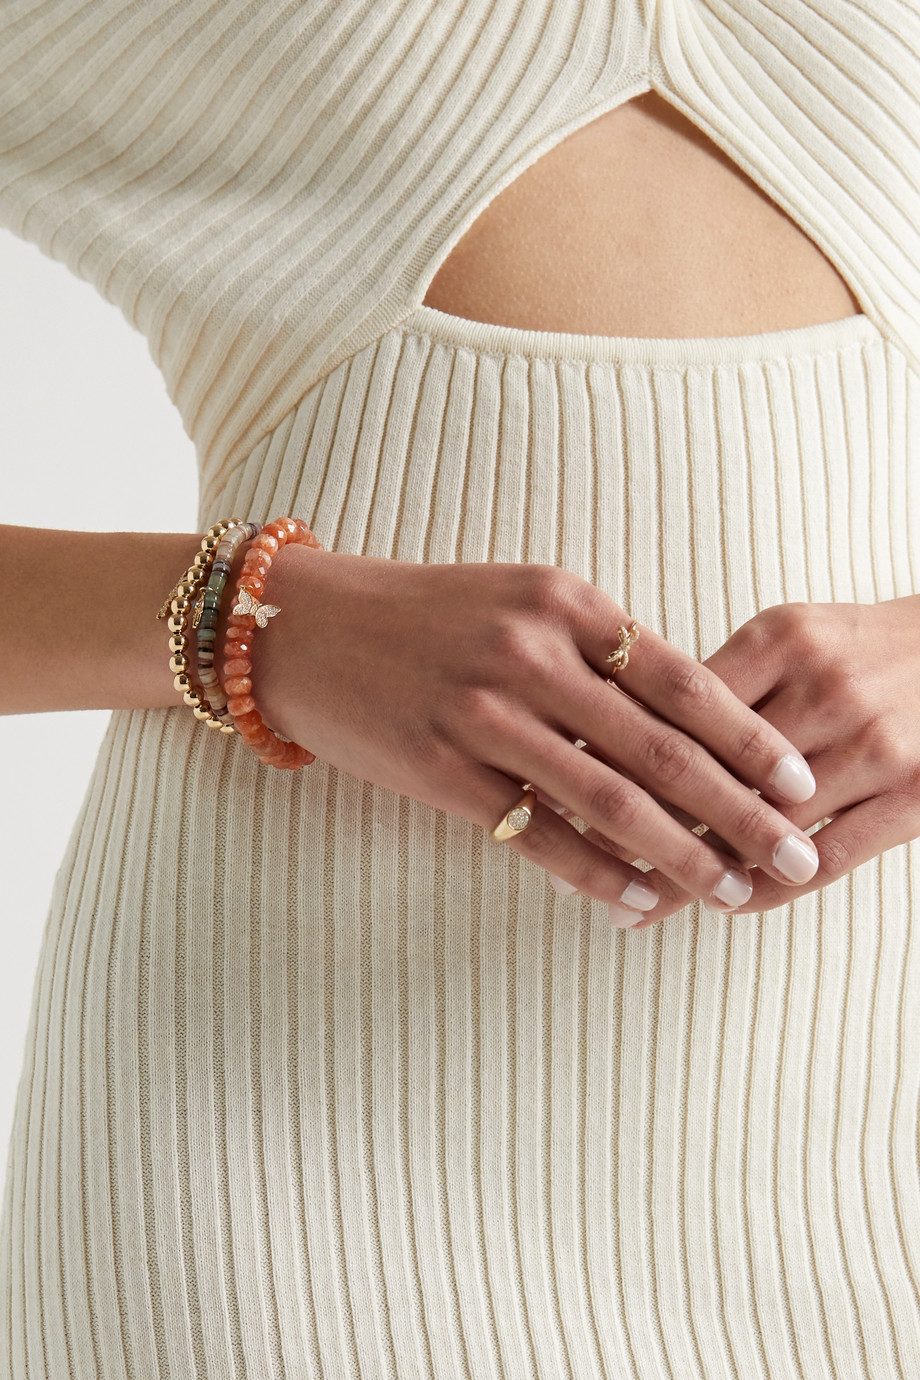 Sydney Evan 14-karat gold, sunstone and diamond bracelet